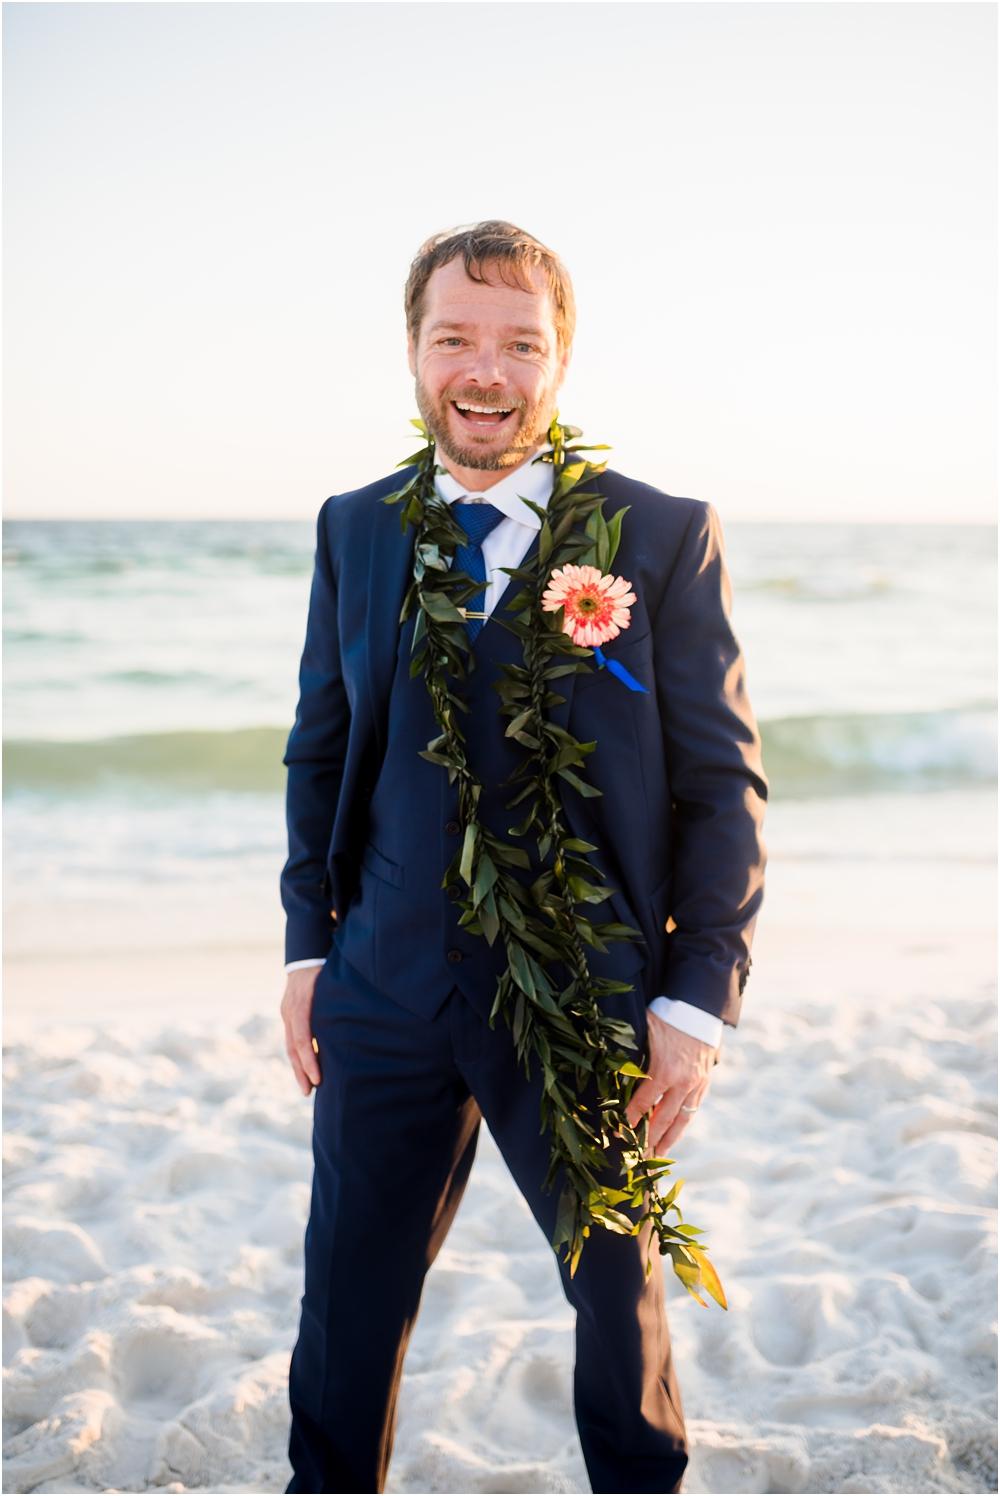 ledman-wedding-kiersten-stevenson-photography-30a-panama-city-beach-dothan-tallahassee-(472-of-763).JPG